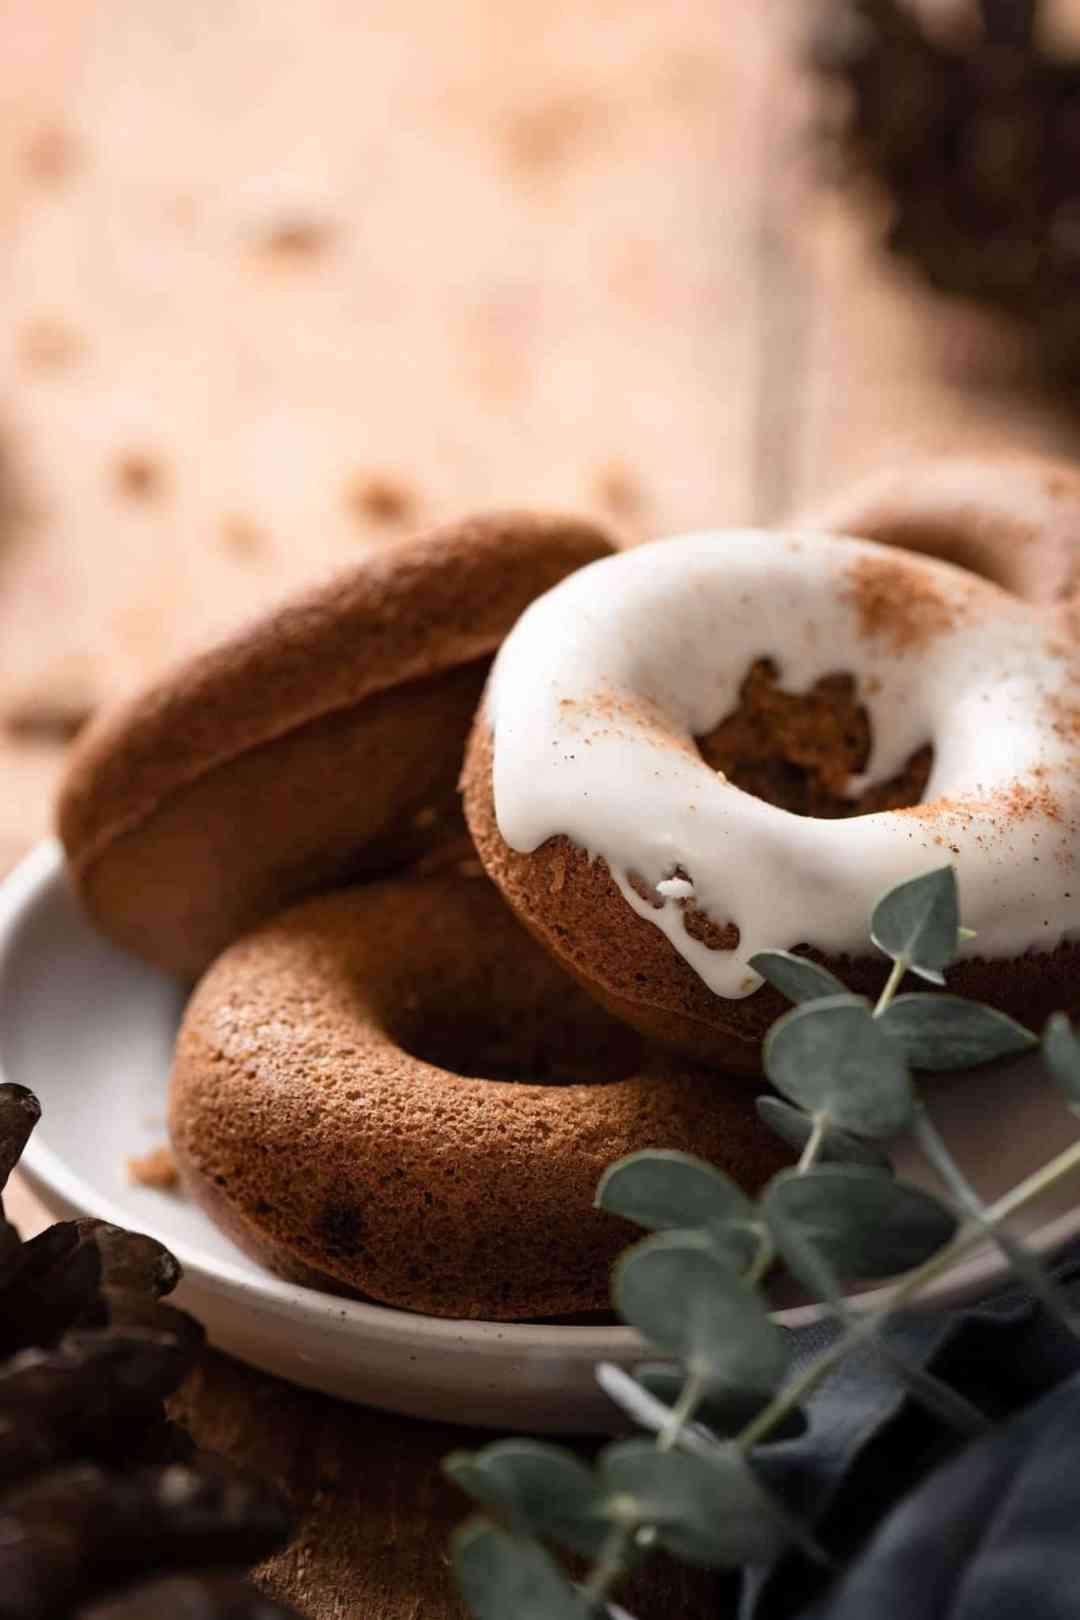 Homemade Gingerbread Doughnuts with vanilla glaze.